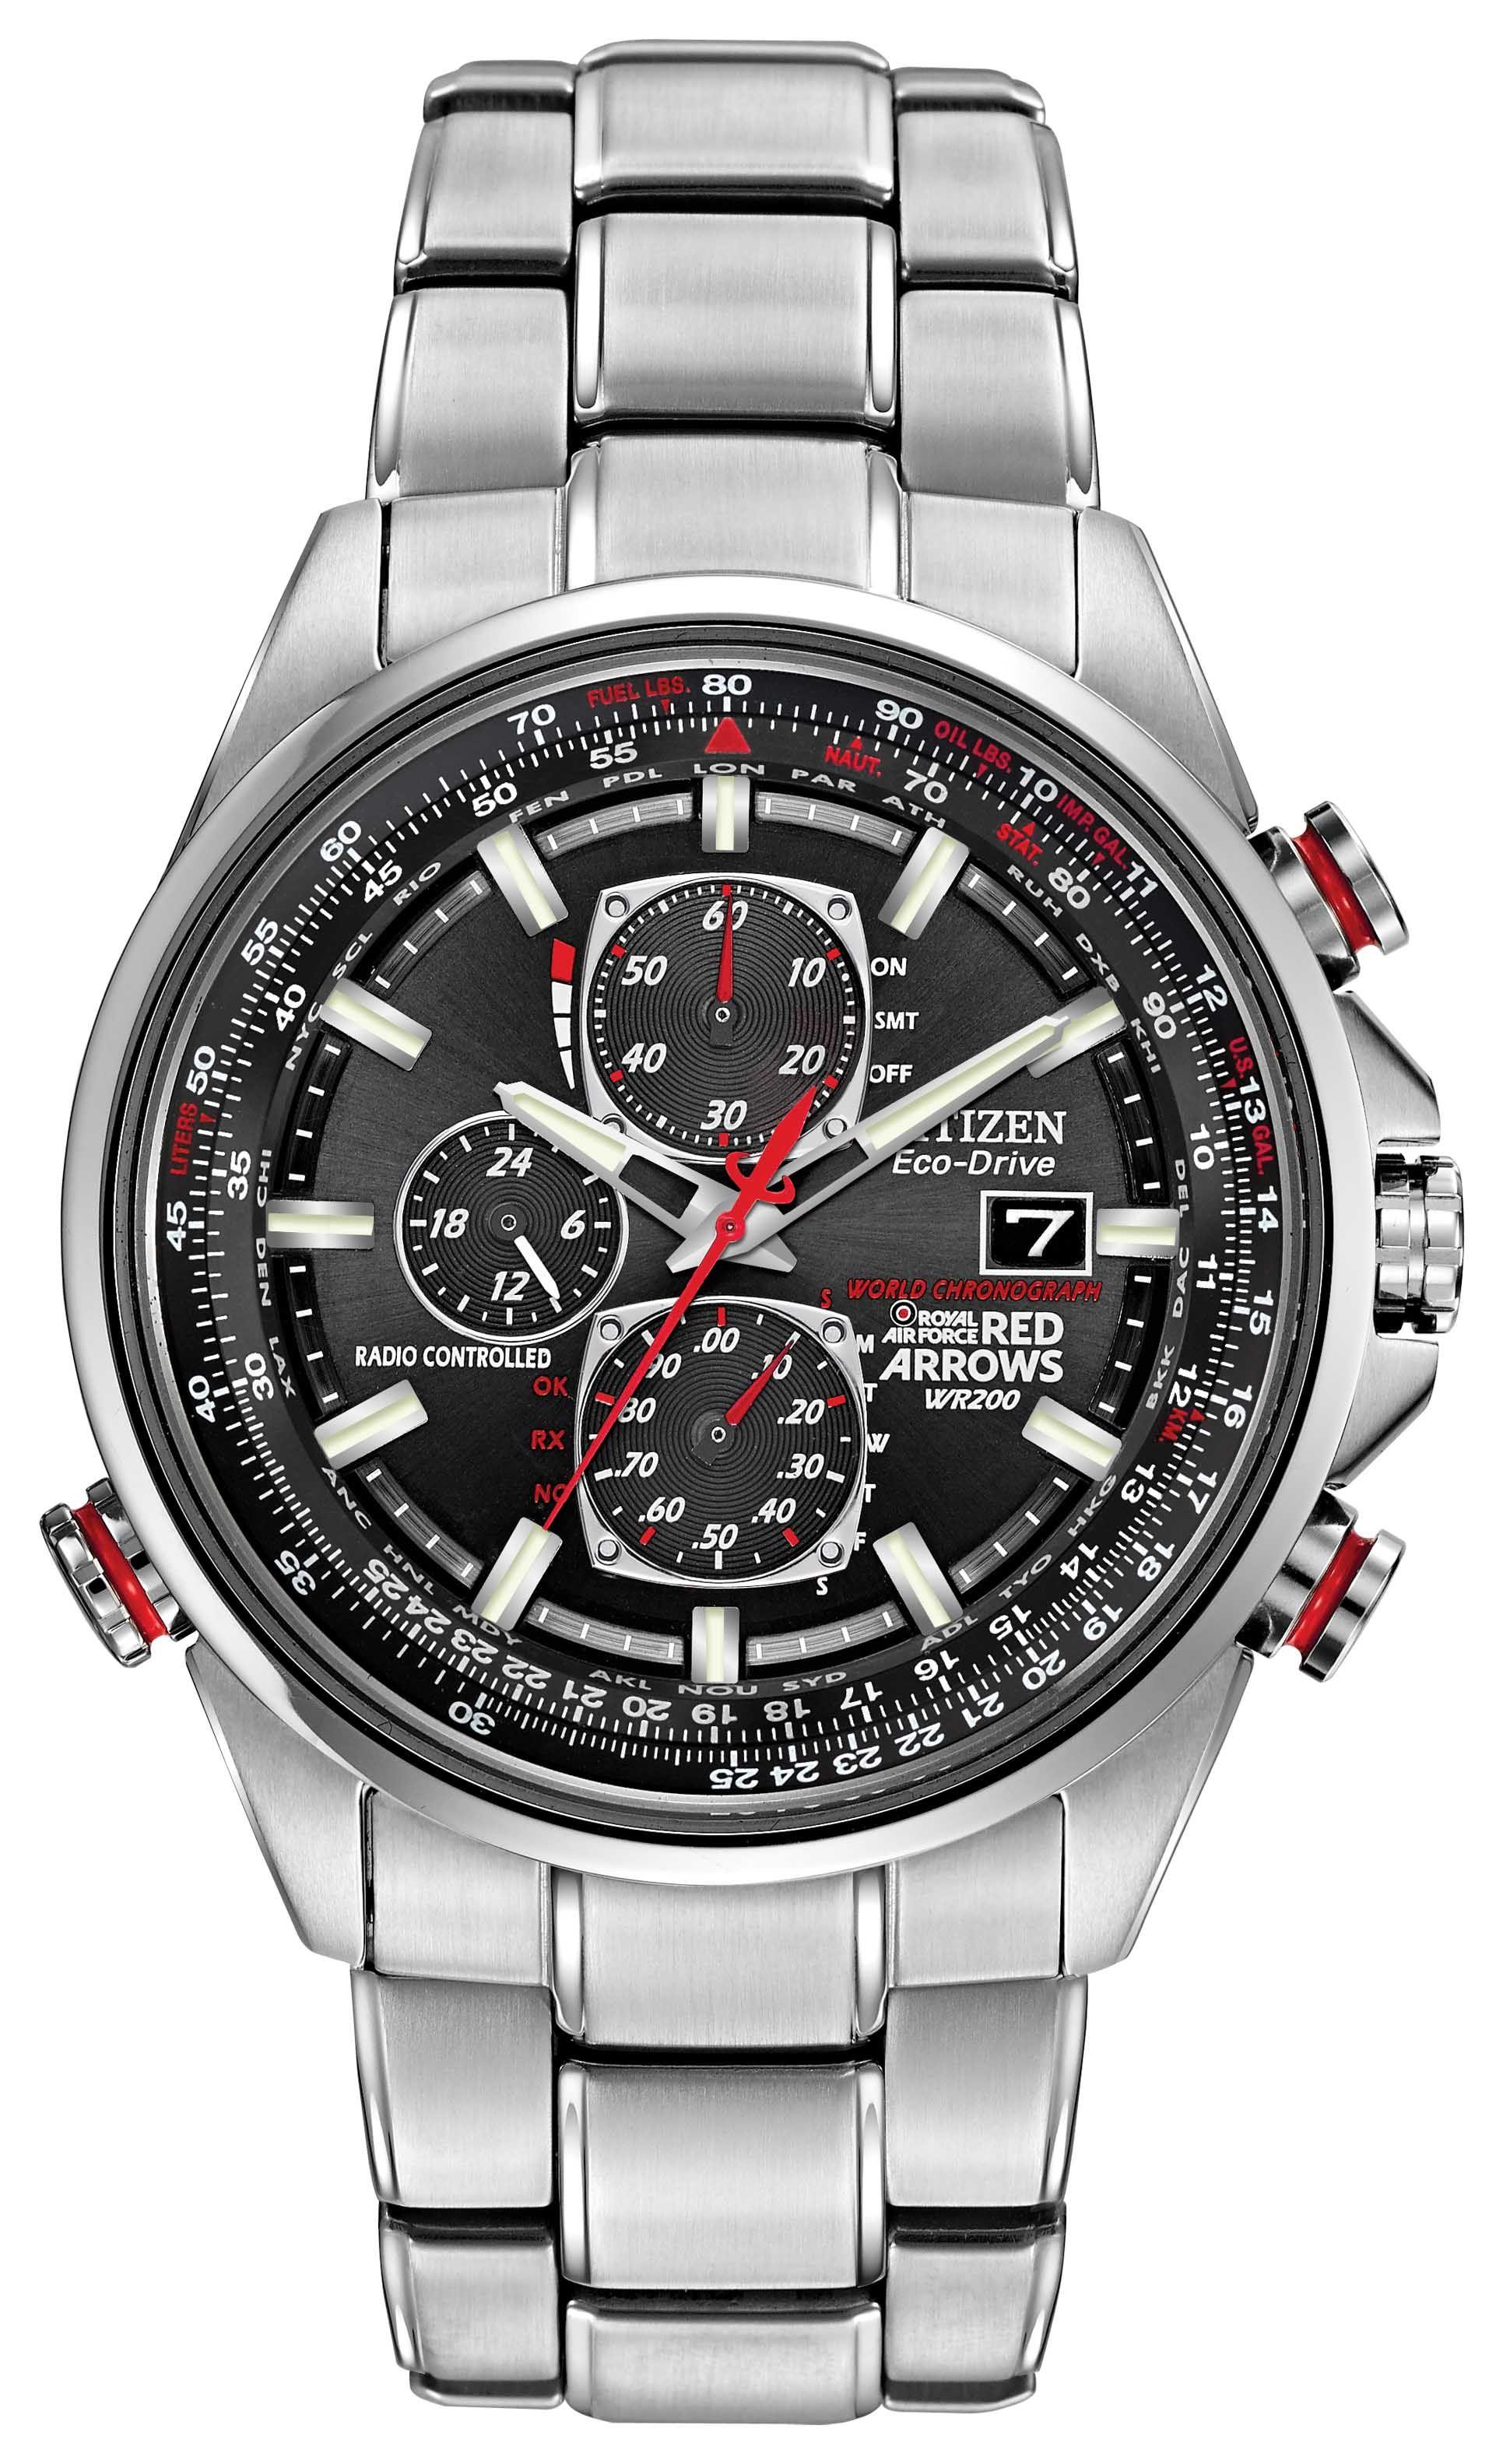 At8060 50e Watches For Men Chronograph Watch Men Citizen Watch